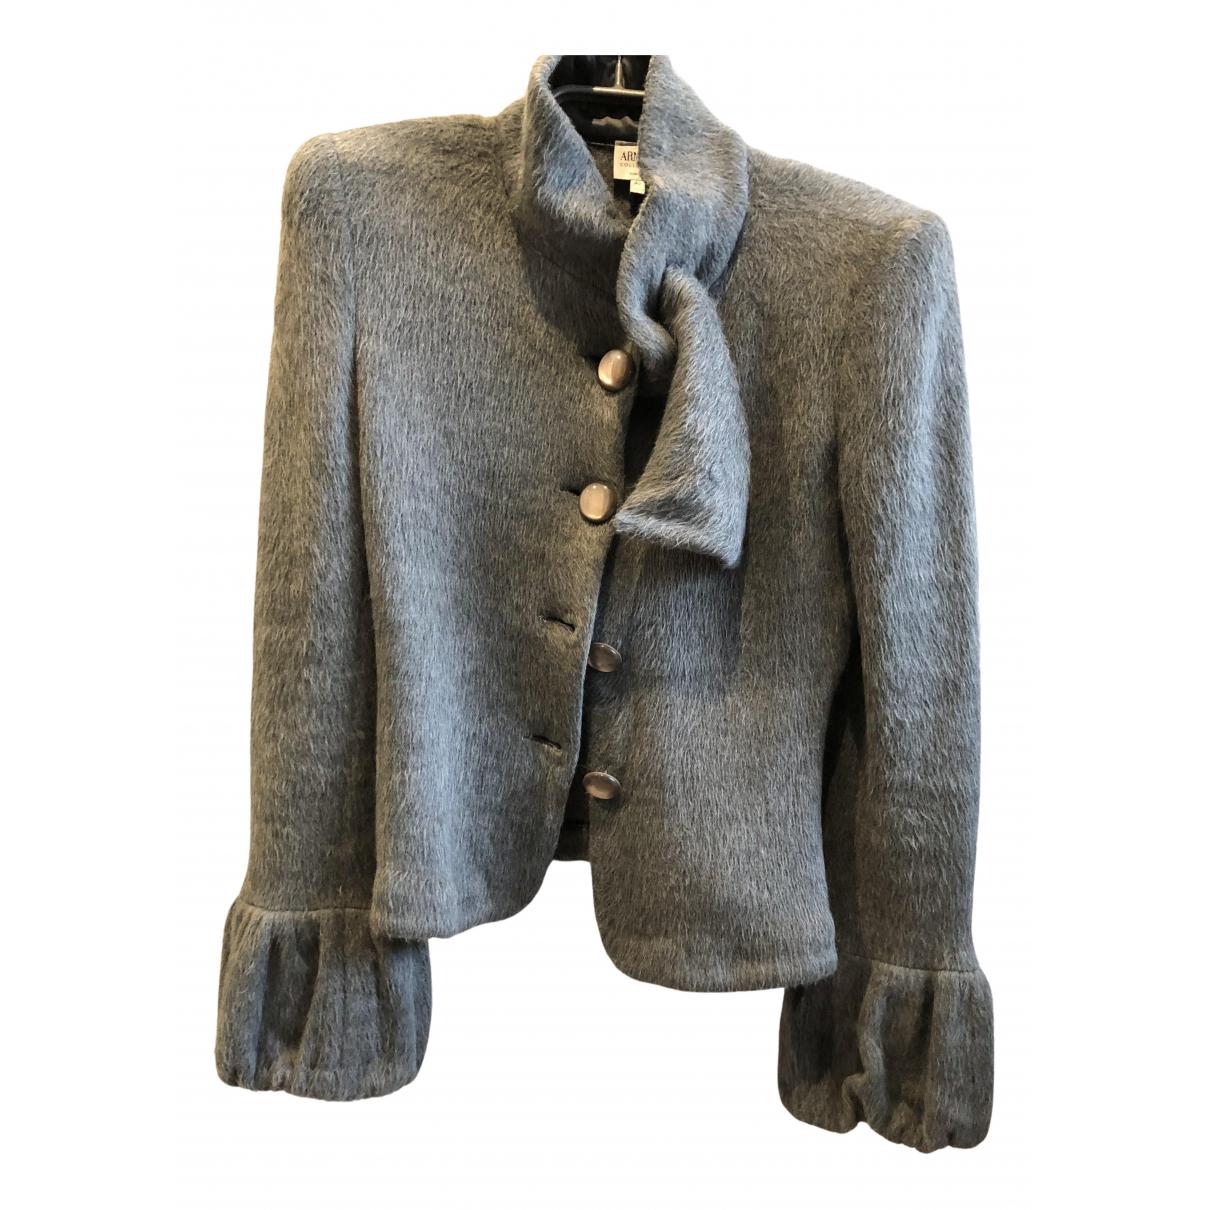 Armani Collezioni \N Jacke in  Grau Wolle